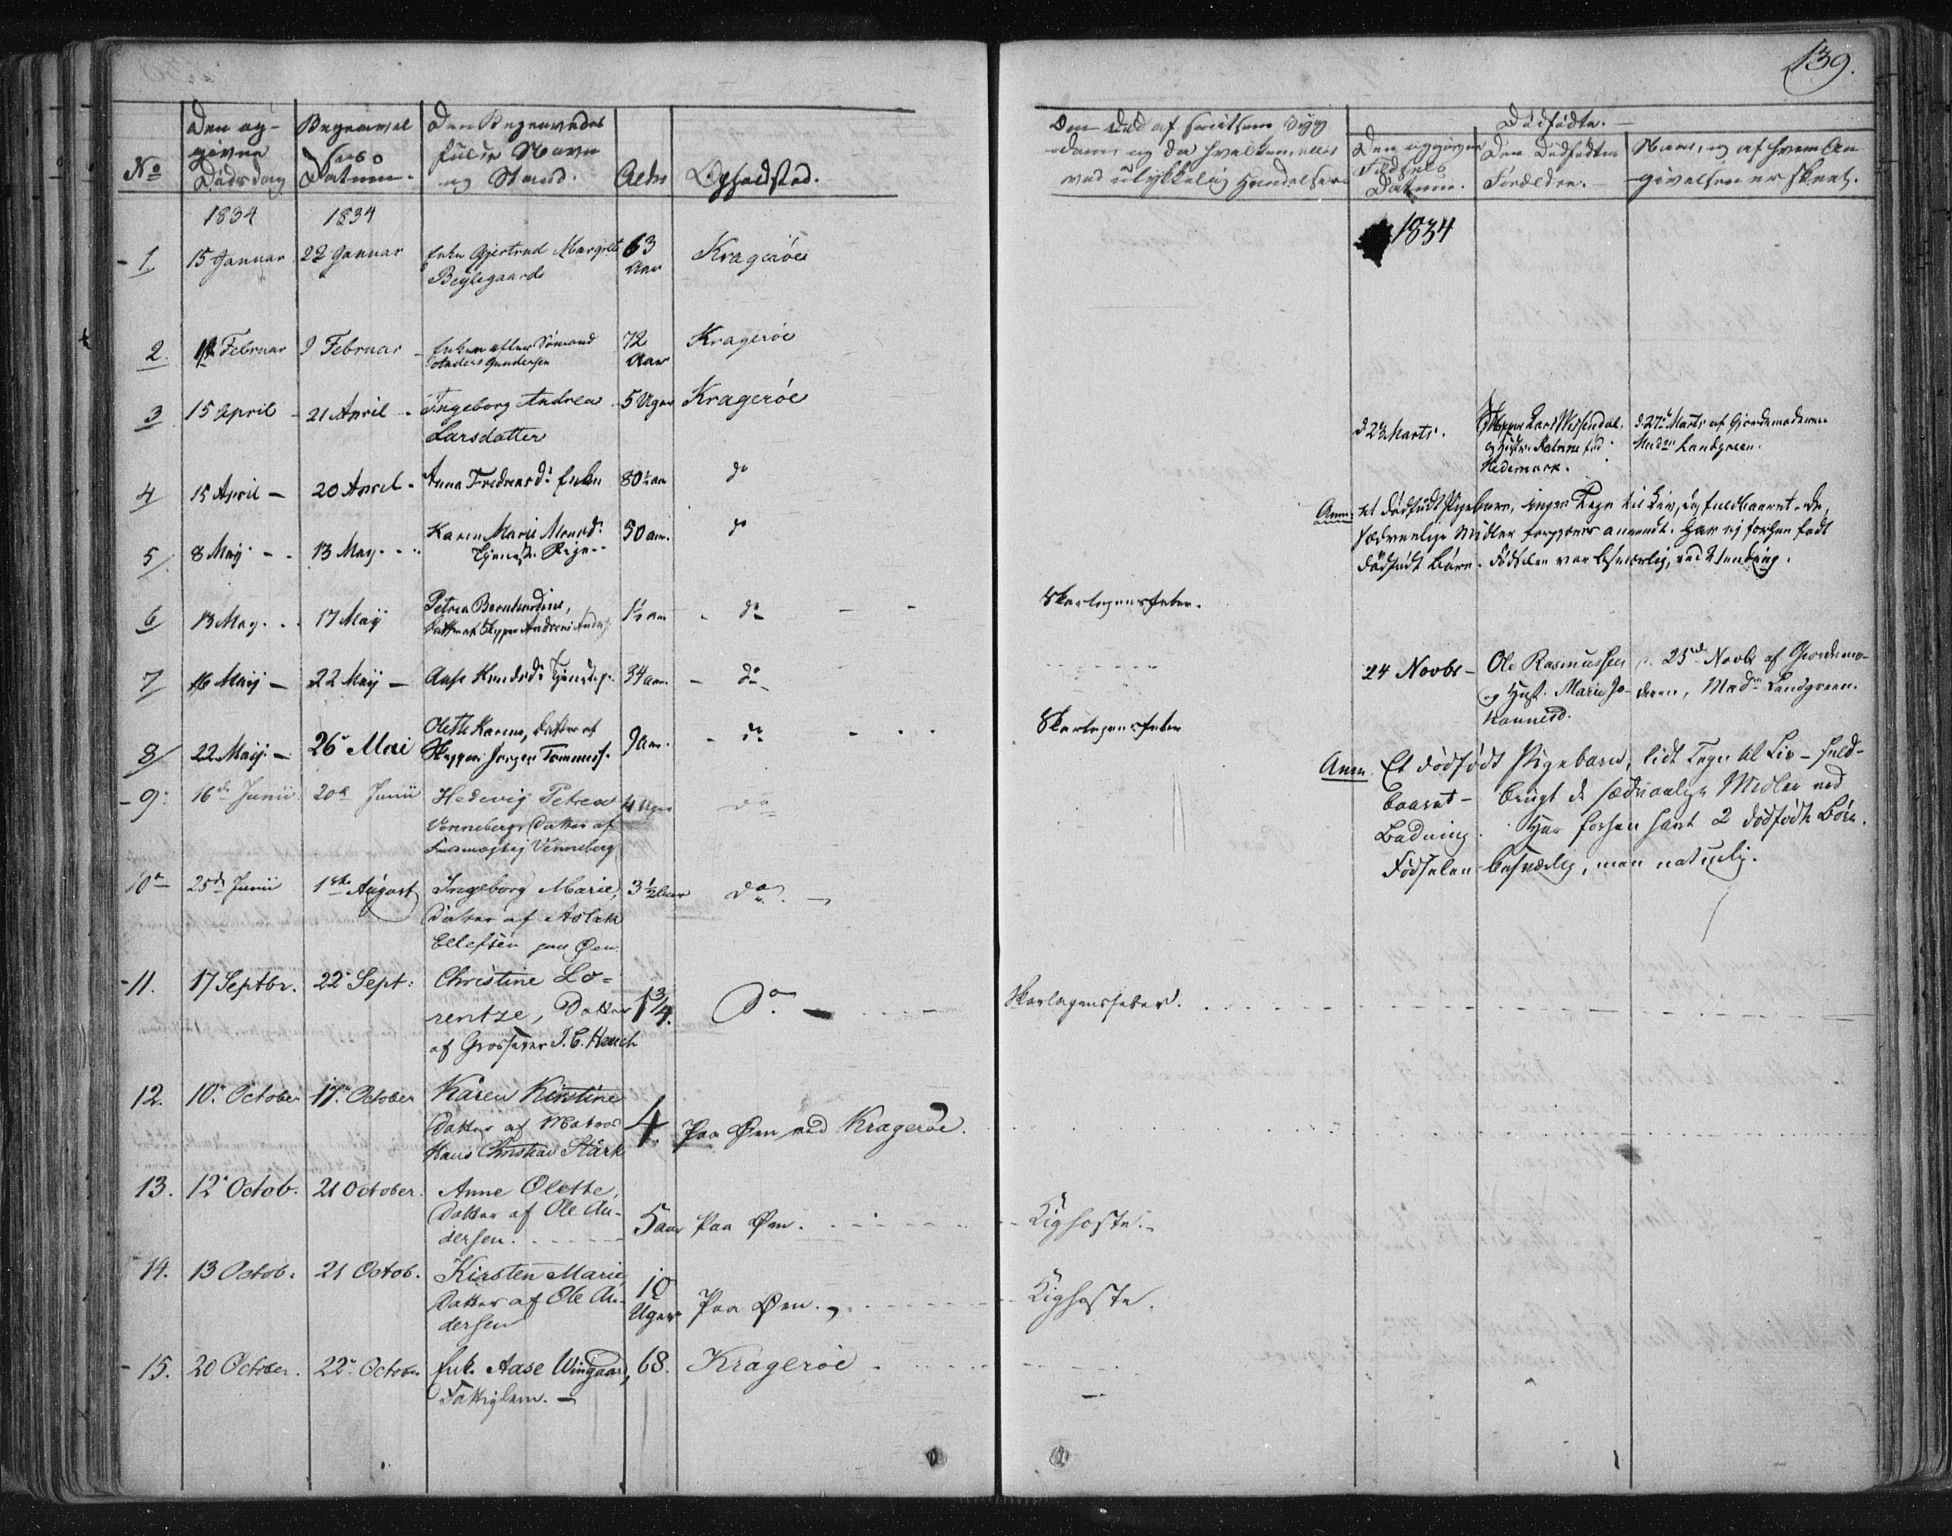 SAKO, Kragerø kirkebøker, F/Fa/L0005: Ministerialbok nr. 5, 1832-1847, s. 139